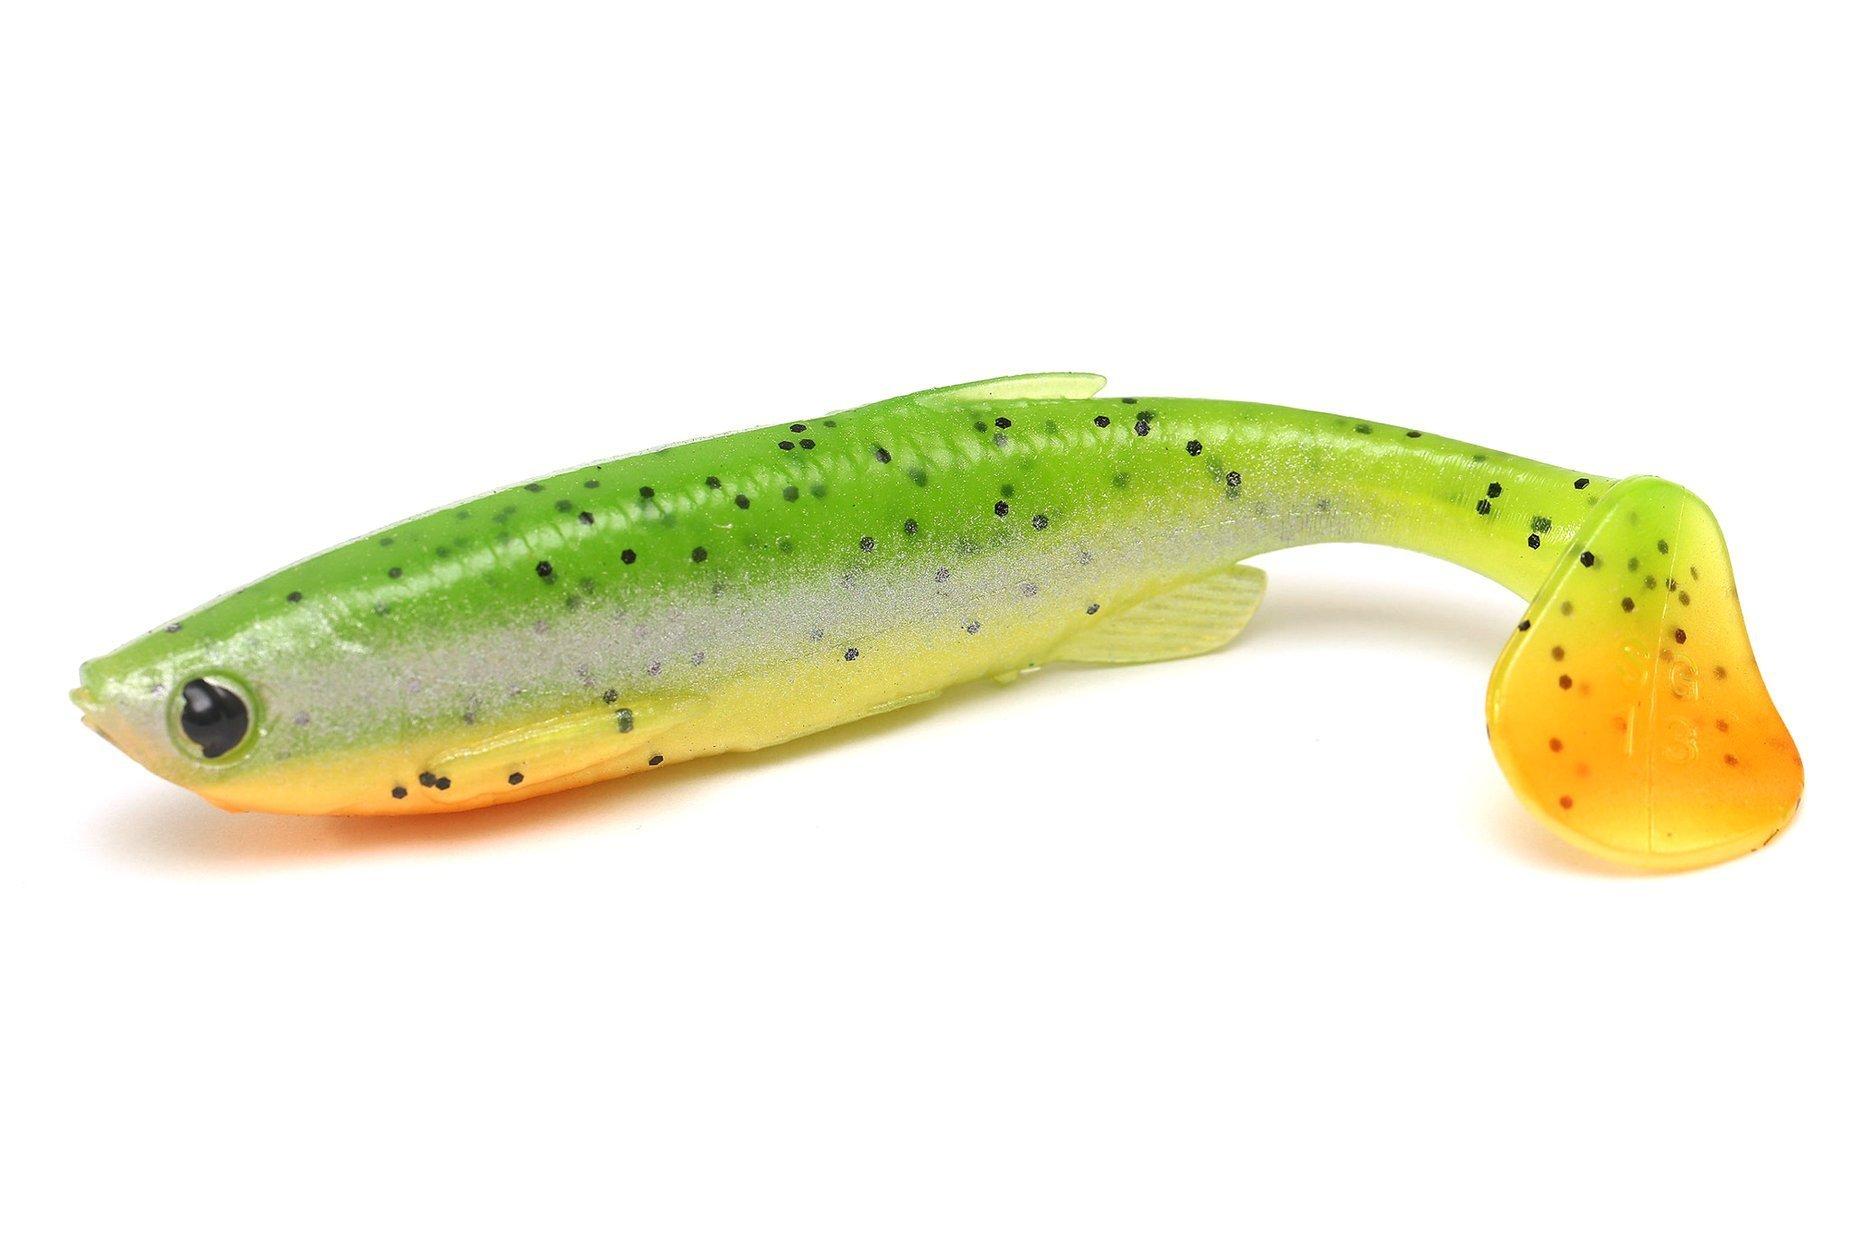 Savage Gear Fat-tail Minnow - Fluo Green Silver 7.5cm 5g